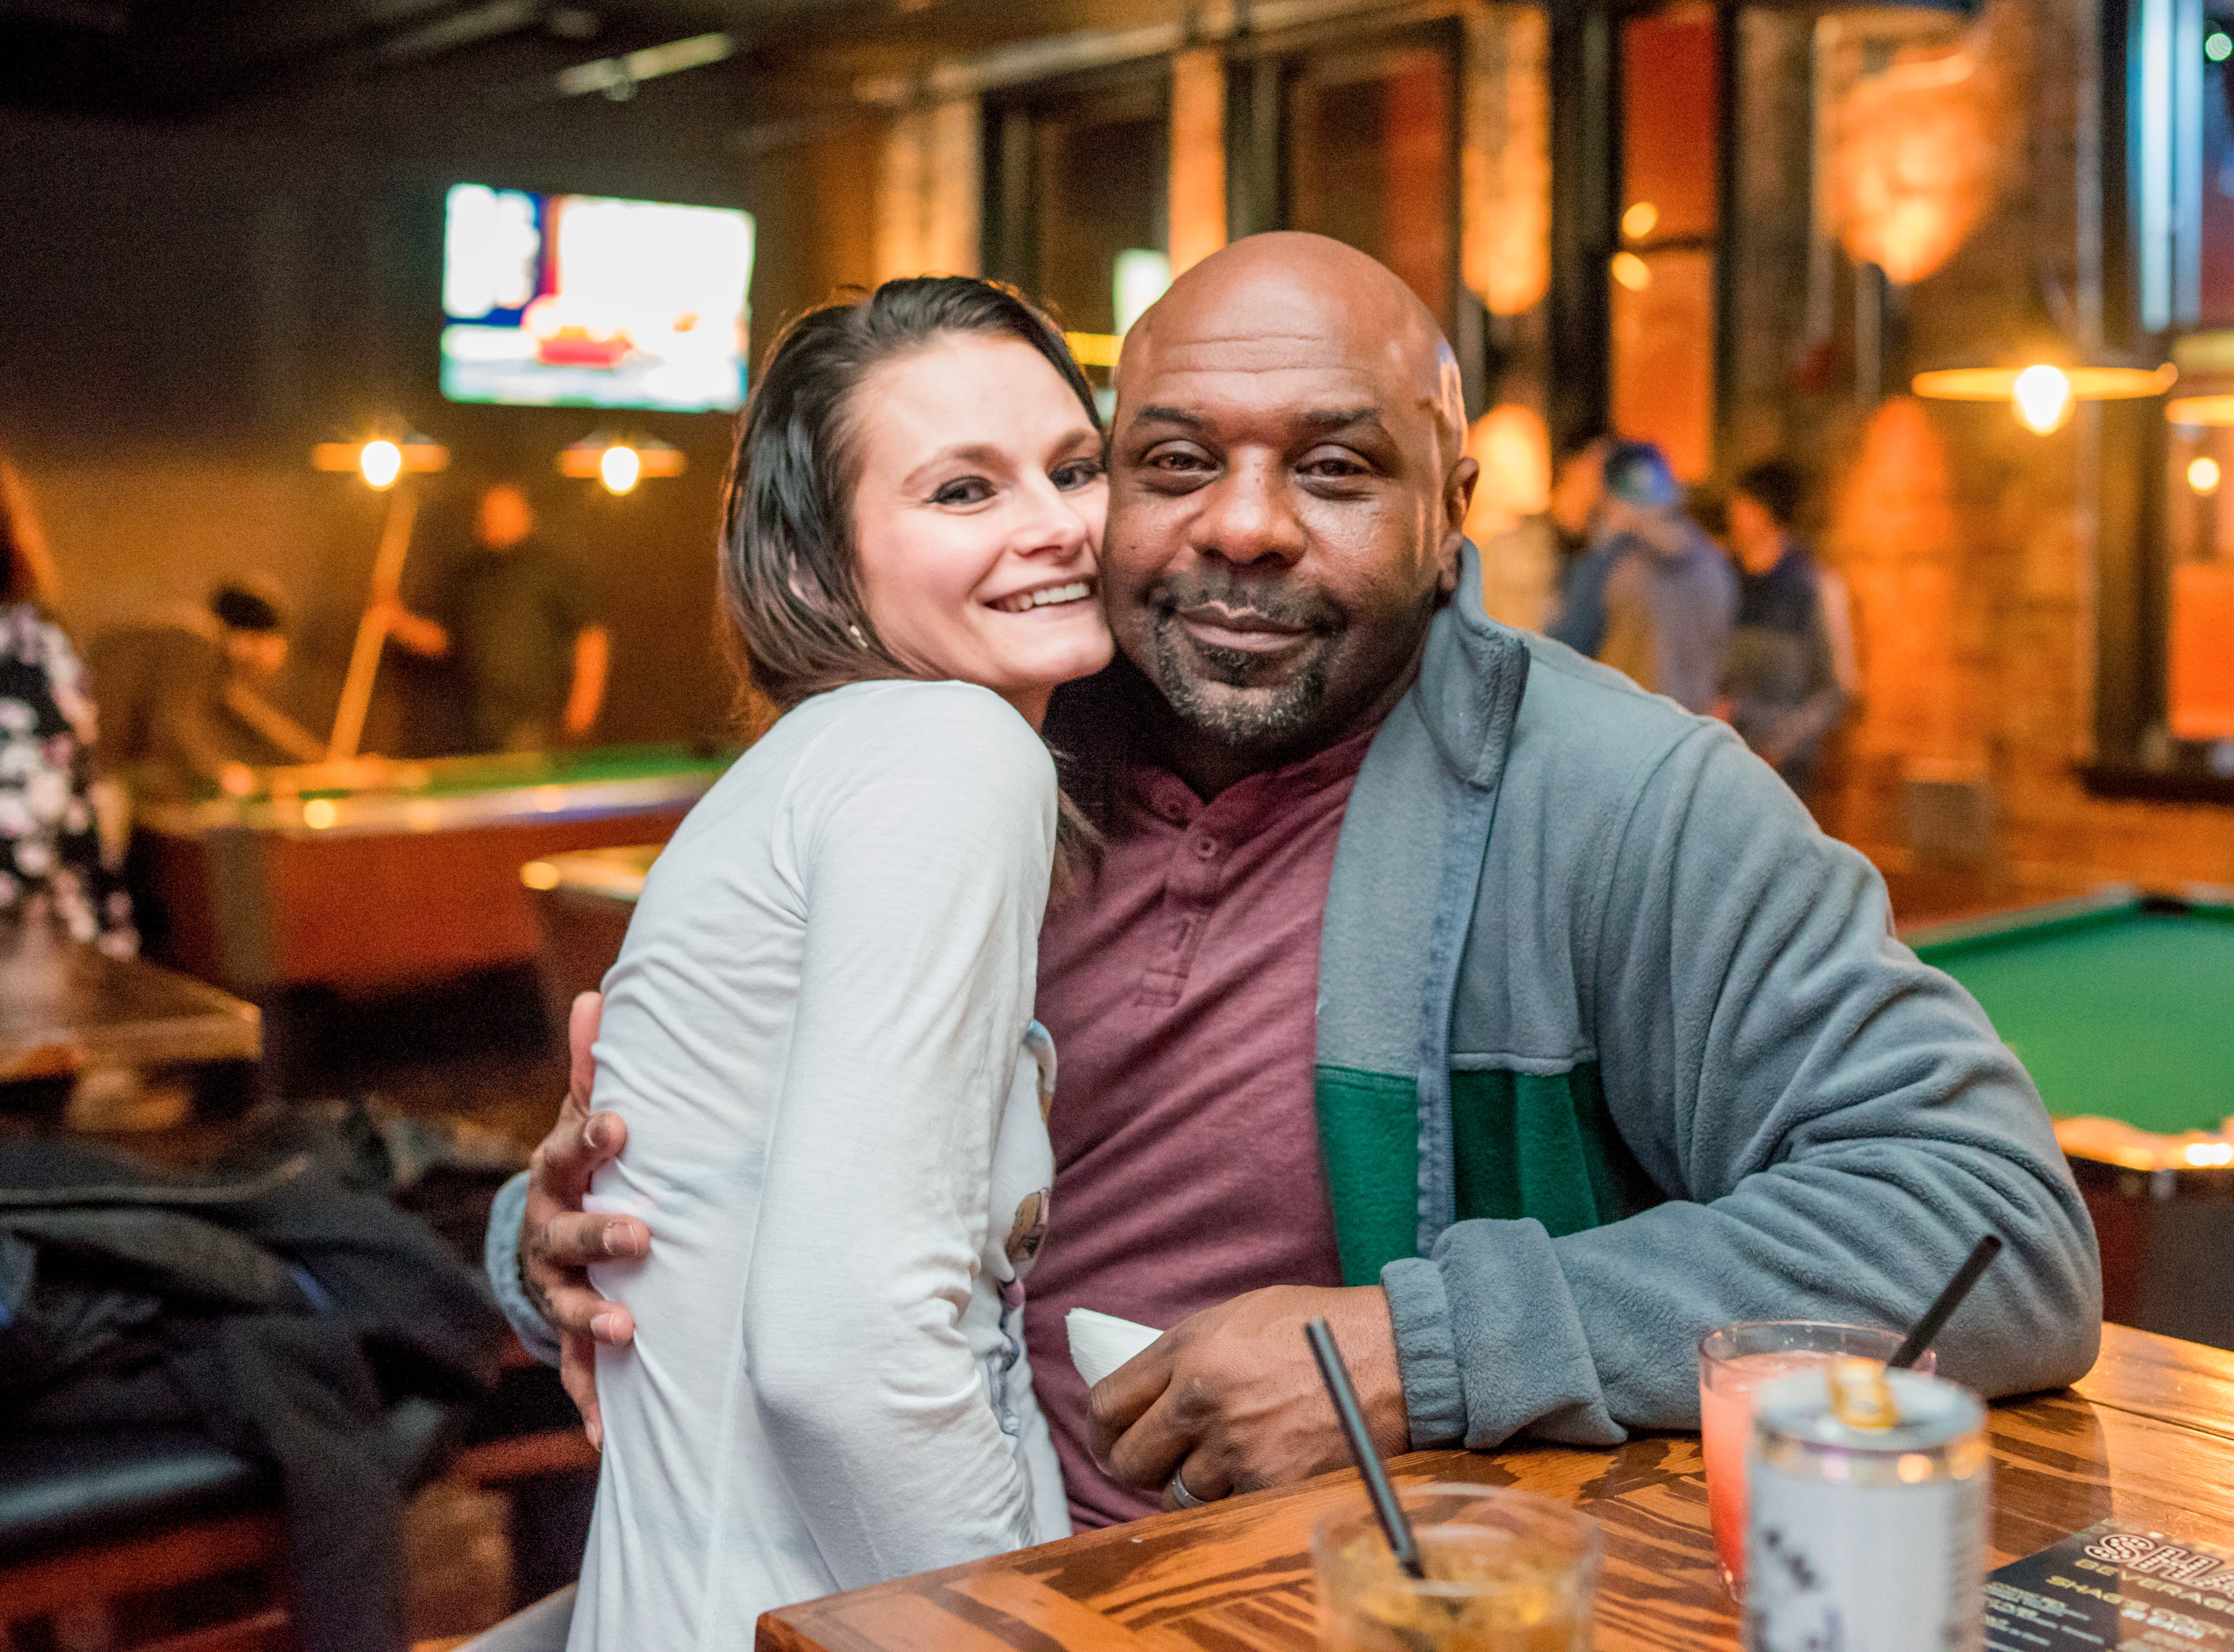 Lola Conway, 34, and David Jones, 44, both of Des Moines, having a fun time, Friday, Dec. 14 at Shags.